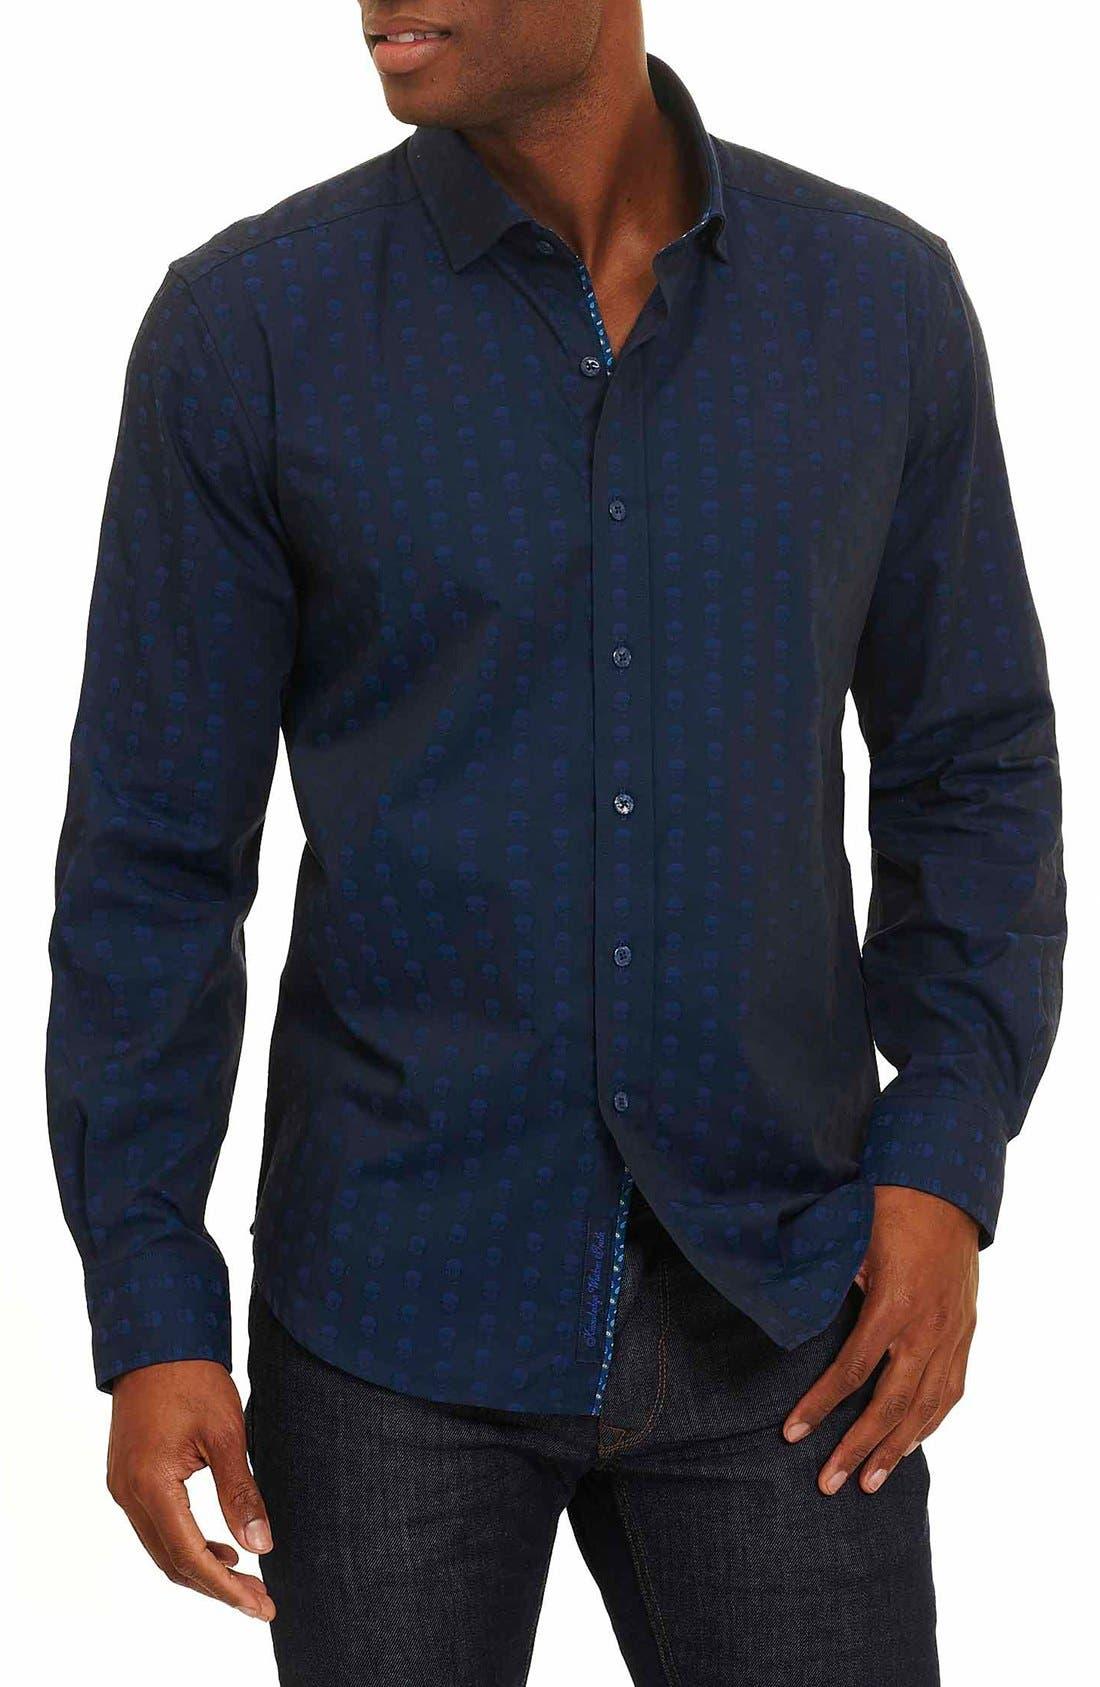 Deven Tailored Fit Sport Shirt,                         Main,                         color, Navy